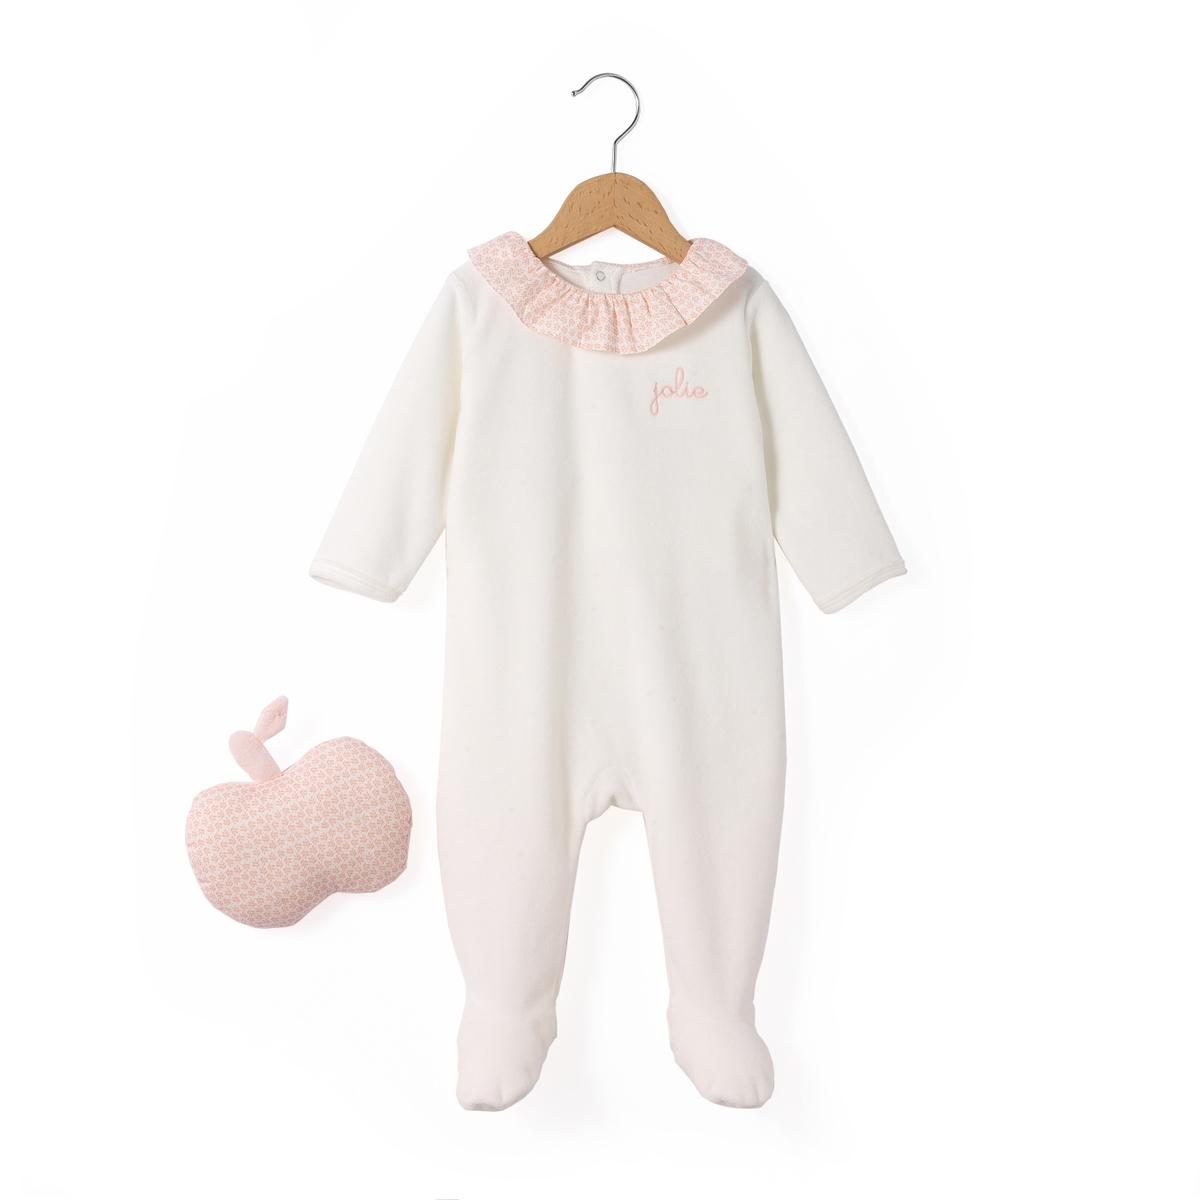 Пижама из велюра + игрушка яблоко 0 мес-3 лет от La Redoute Collections